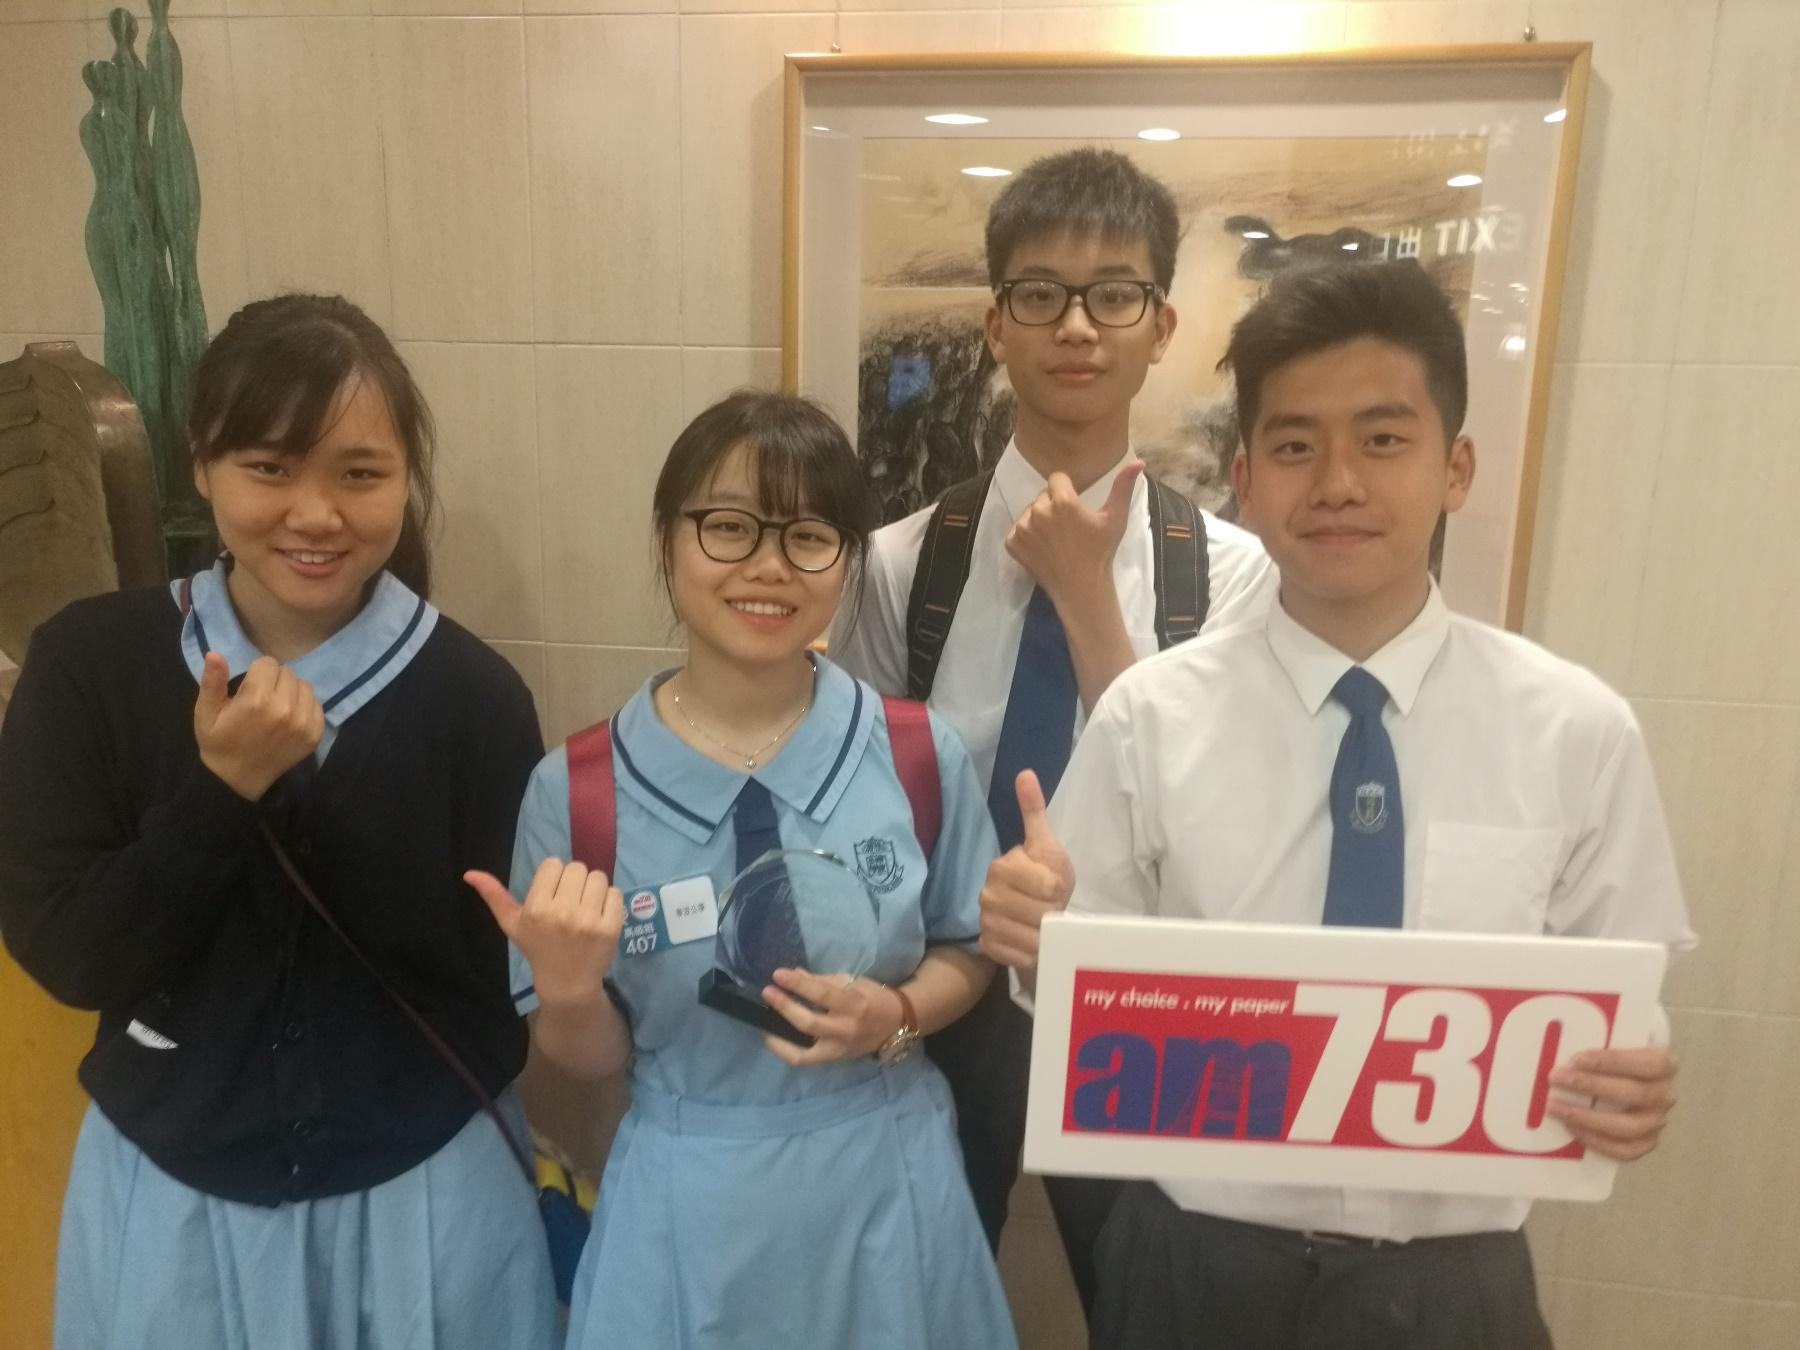 http://npc.edu.hk/sites/default/files/img_20180422_155739.jpg